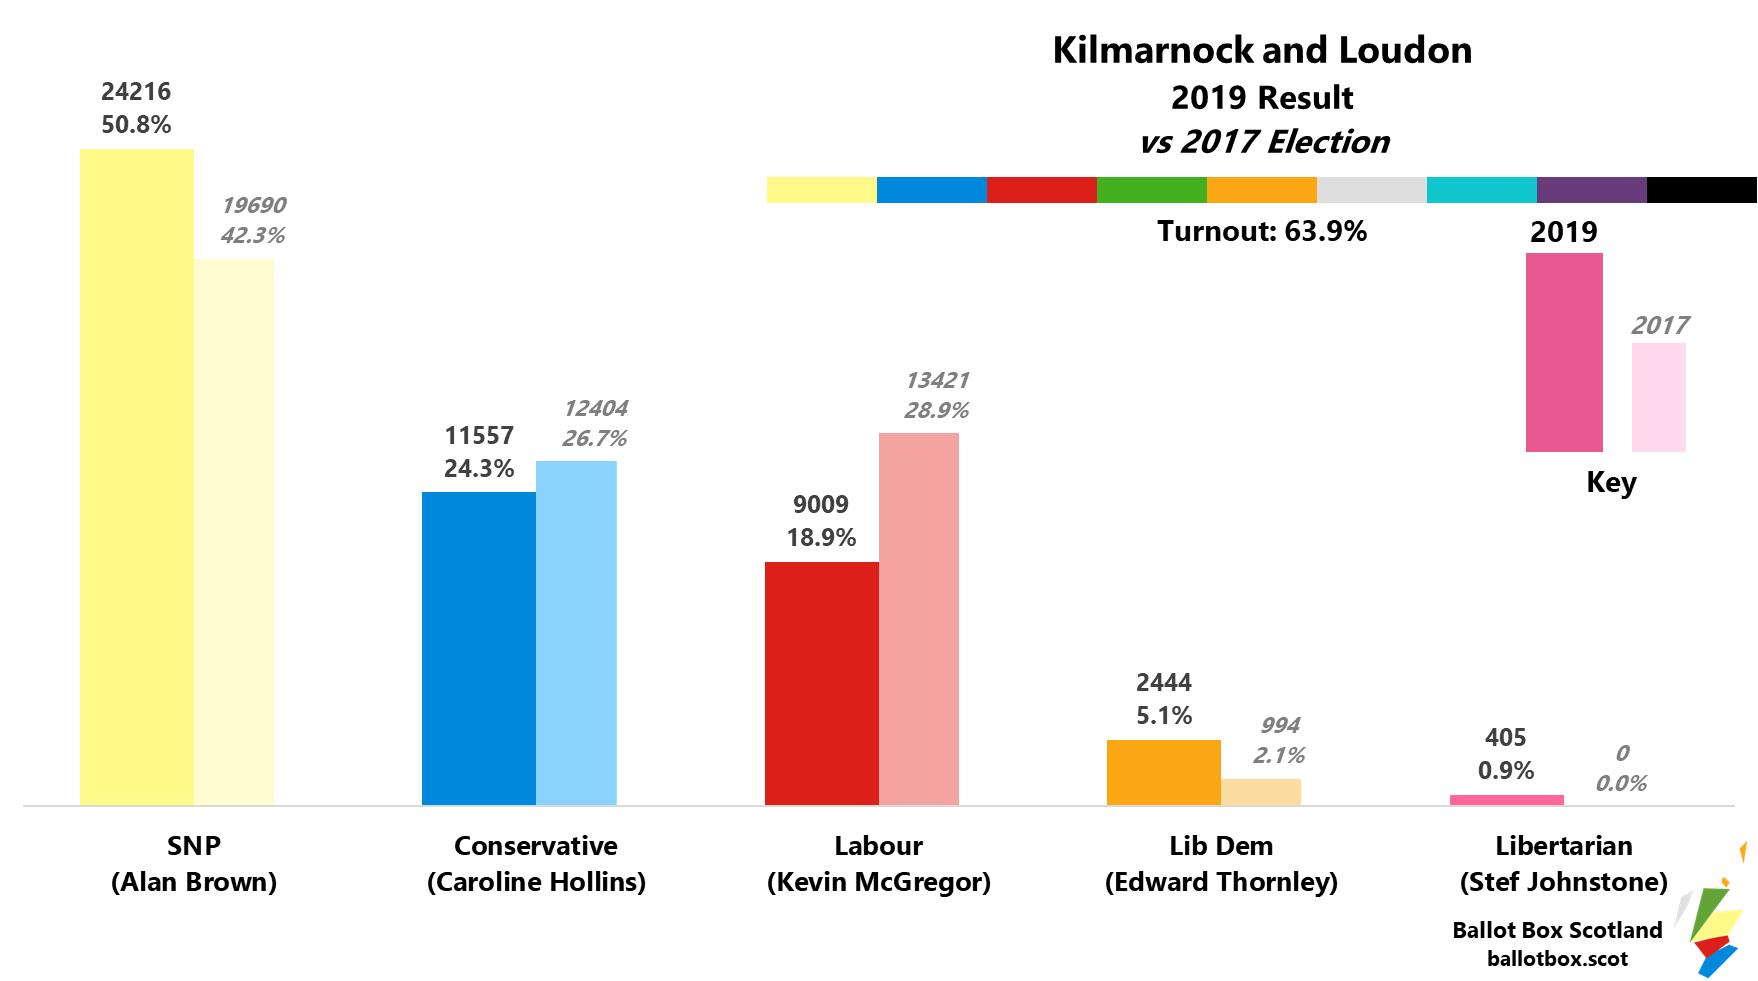 Kilmarnock and Loudon 2019